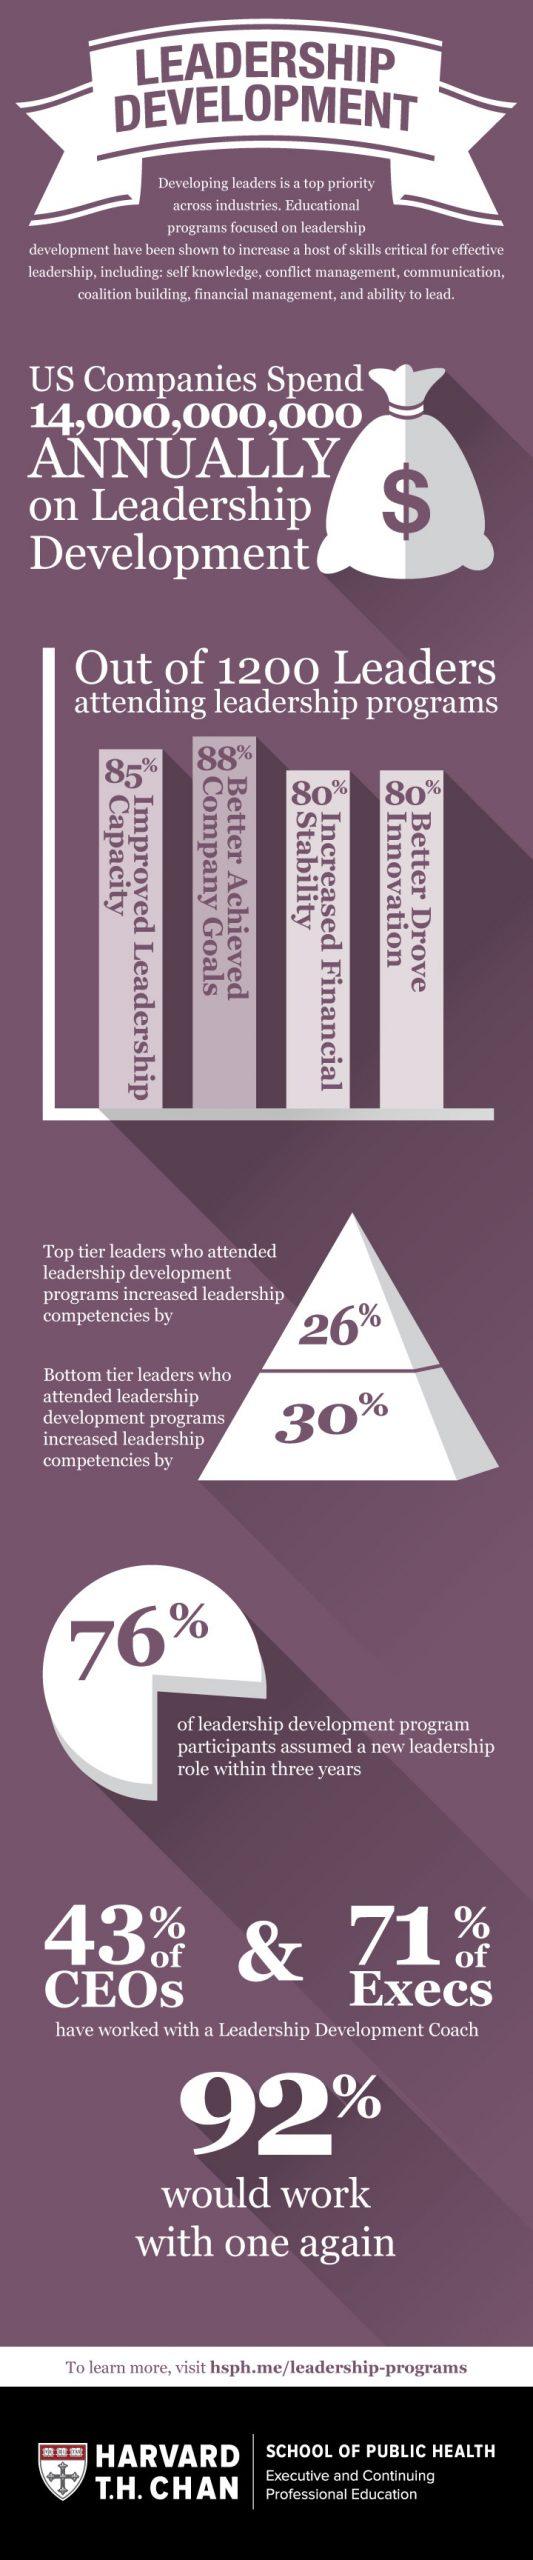 Leadership Development Infographic Image